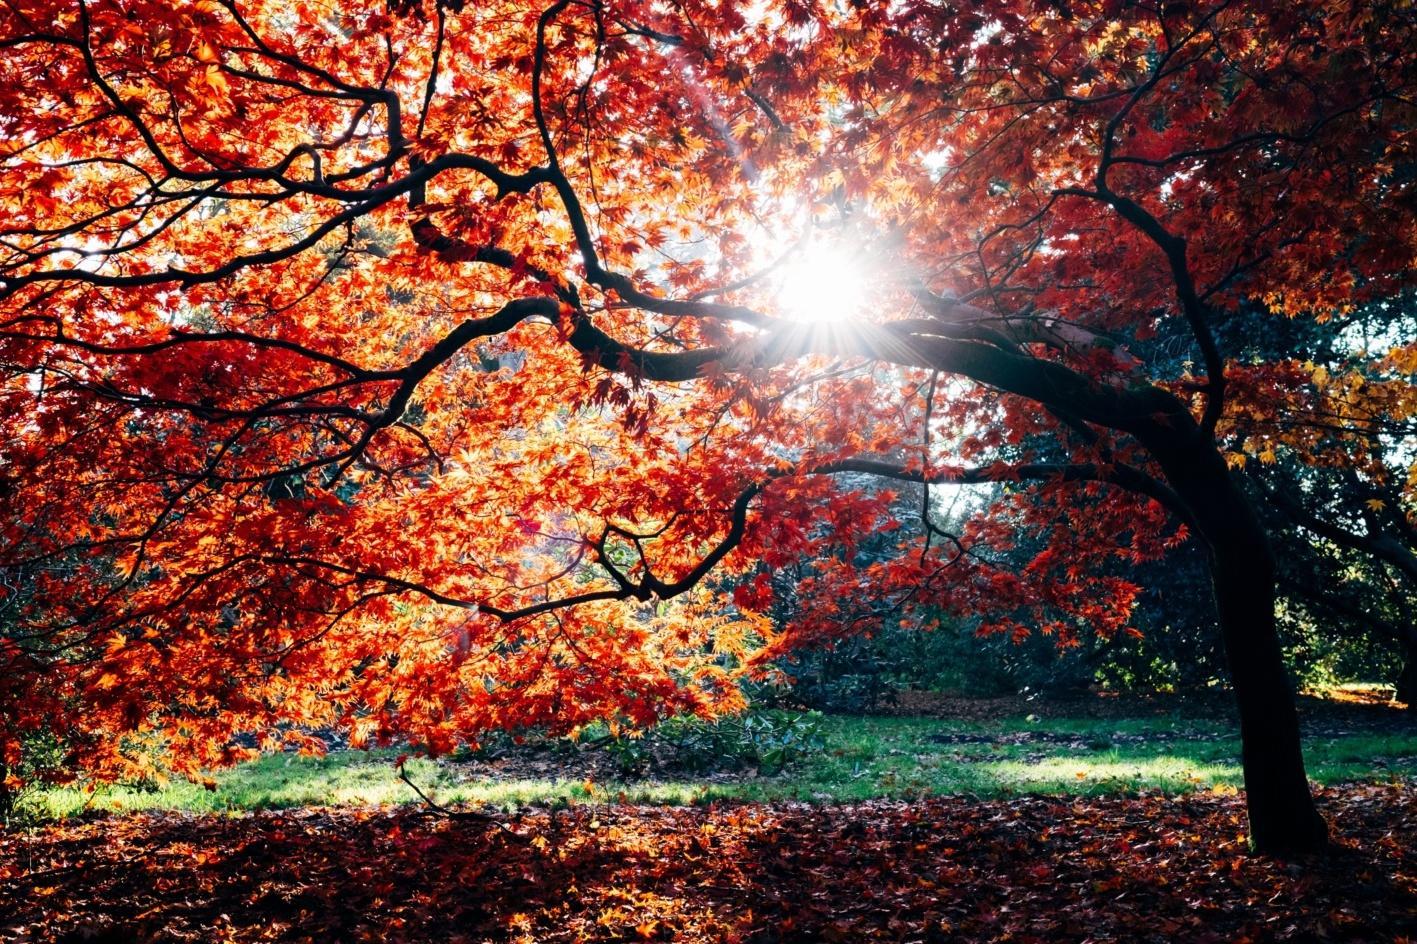 Sunshine peeking through boughs of tree covered in orange autumn leaves